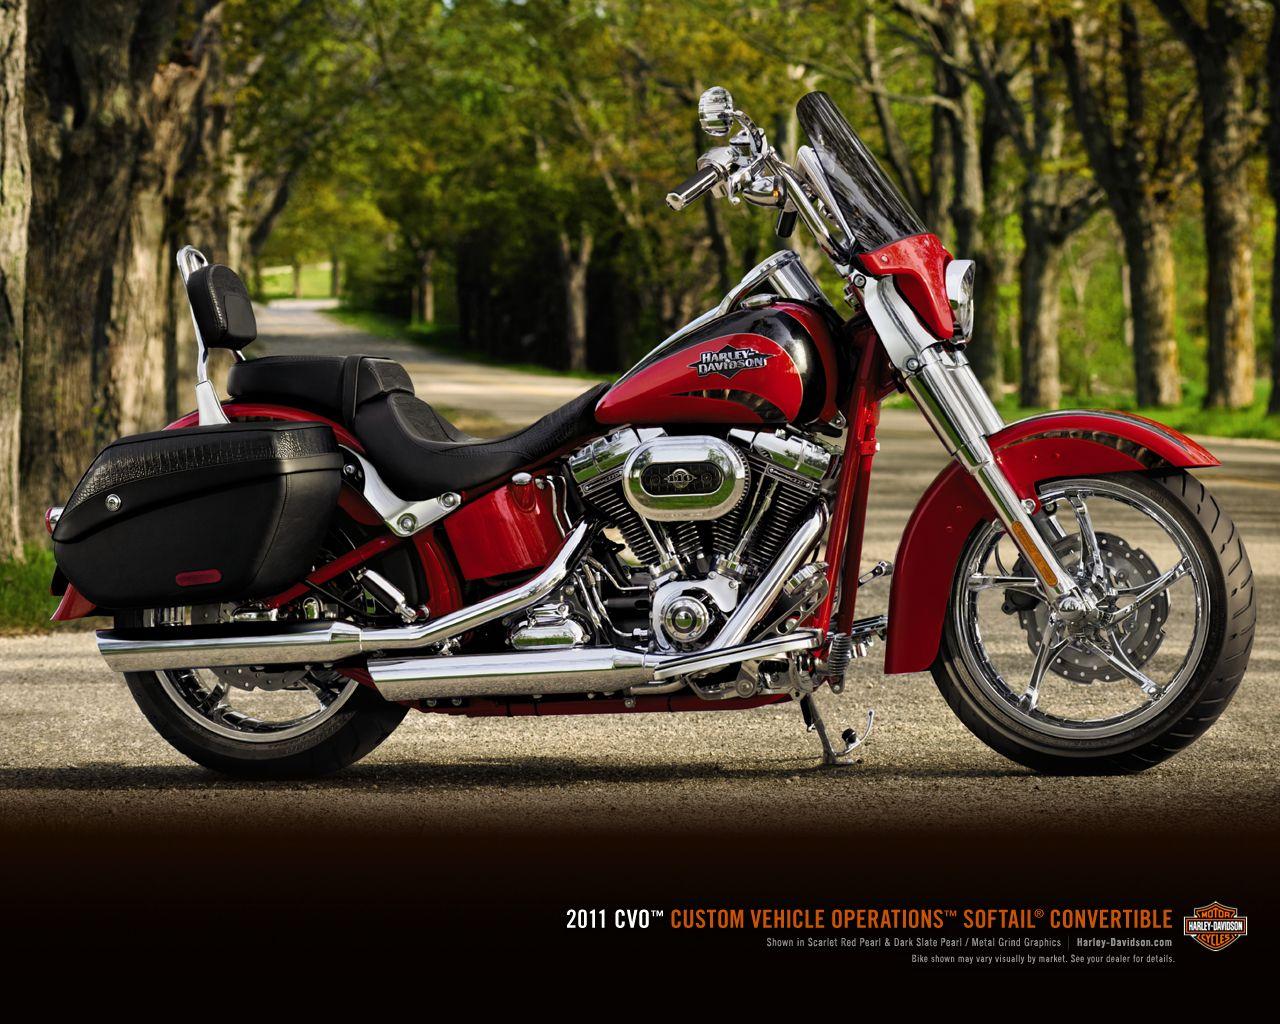 2011 CV0 Softail Convertible Softail, Harley davidson